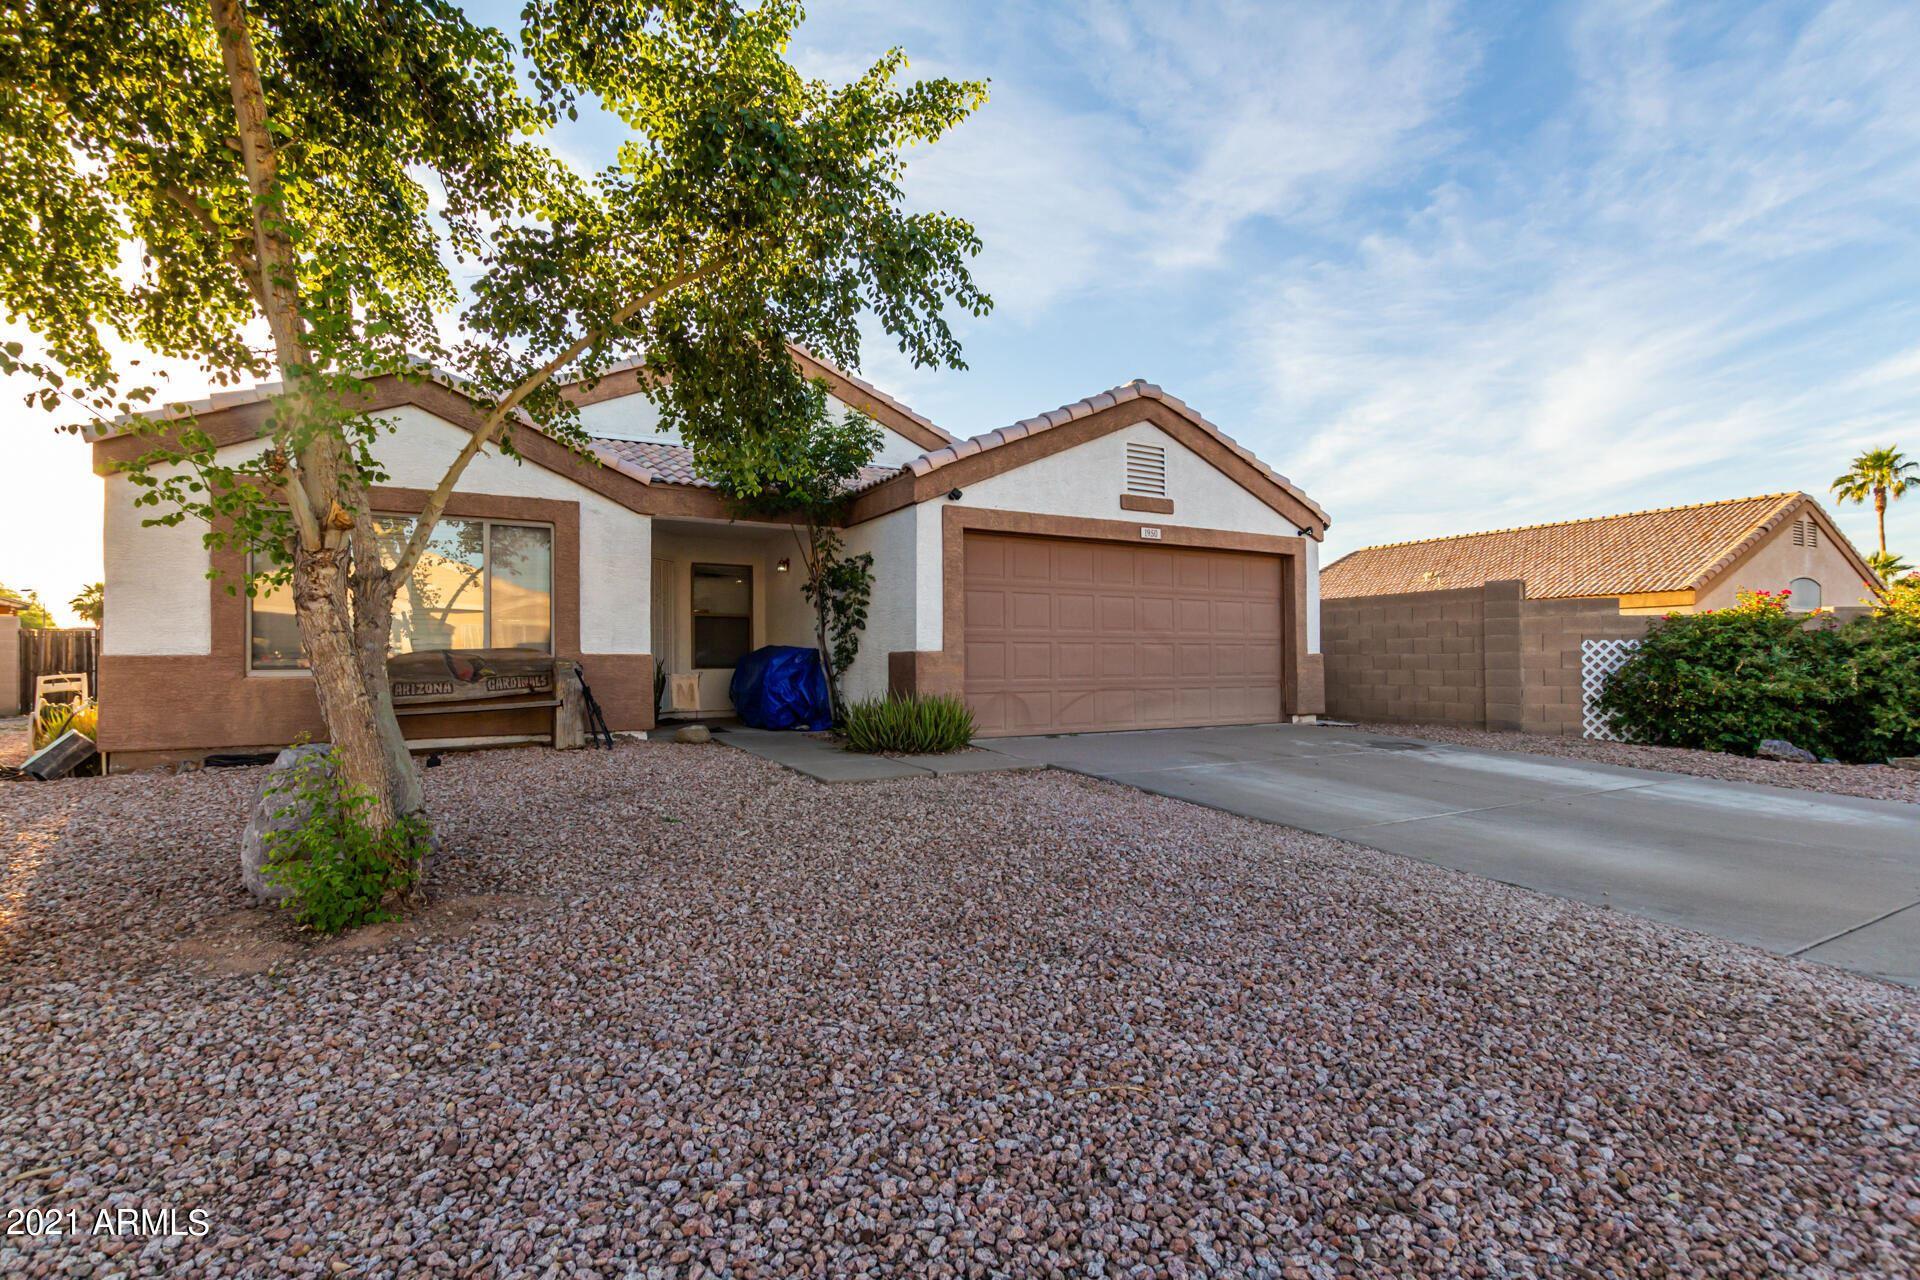 Photo of 1950 S RENNICK Drive, Apache Junction, AZ 85120 (MLS # 6304283)